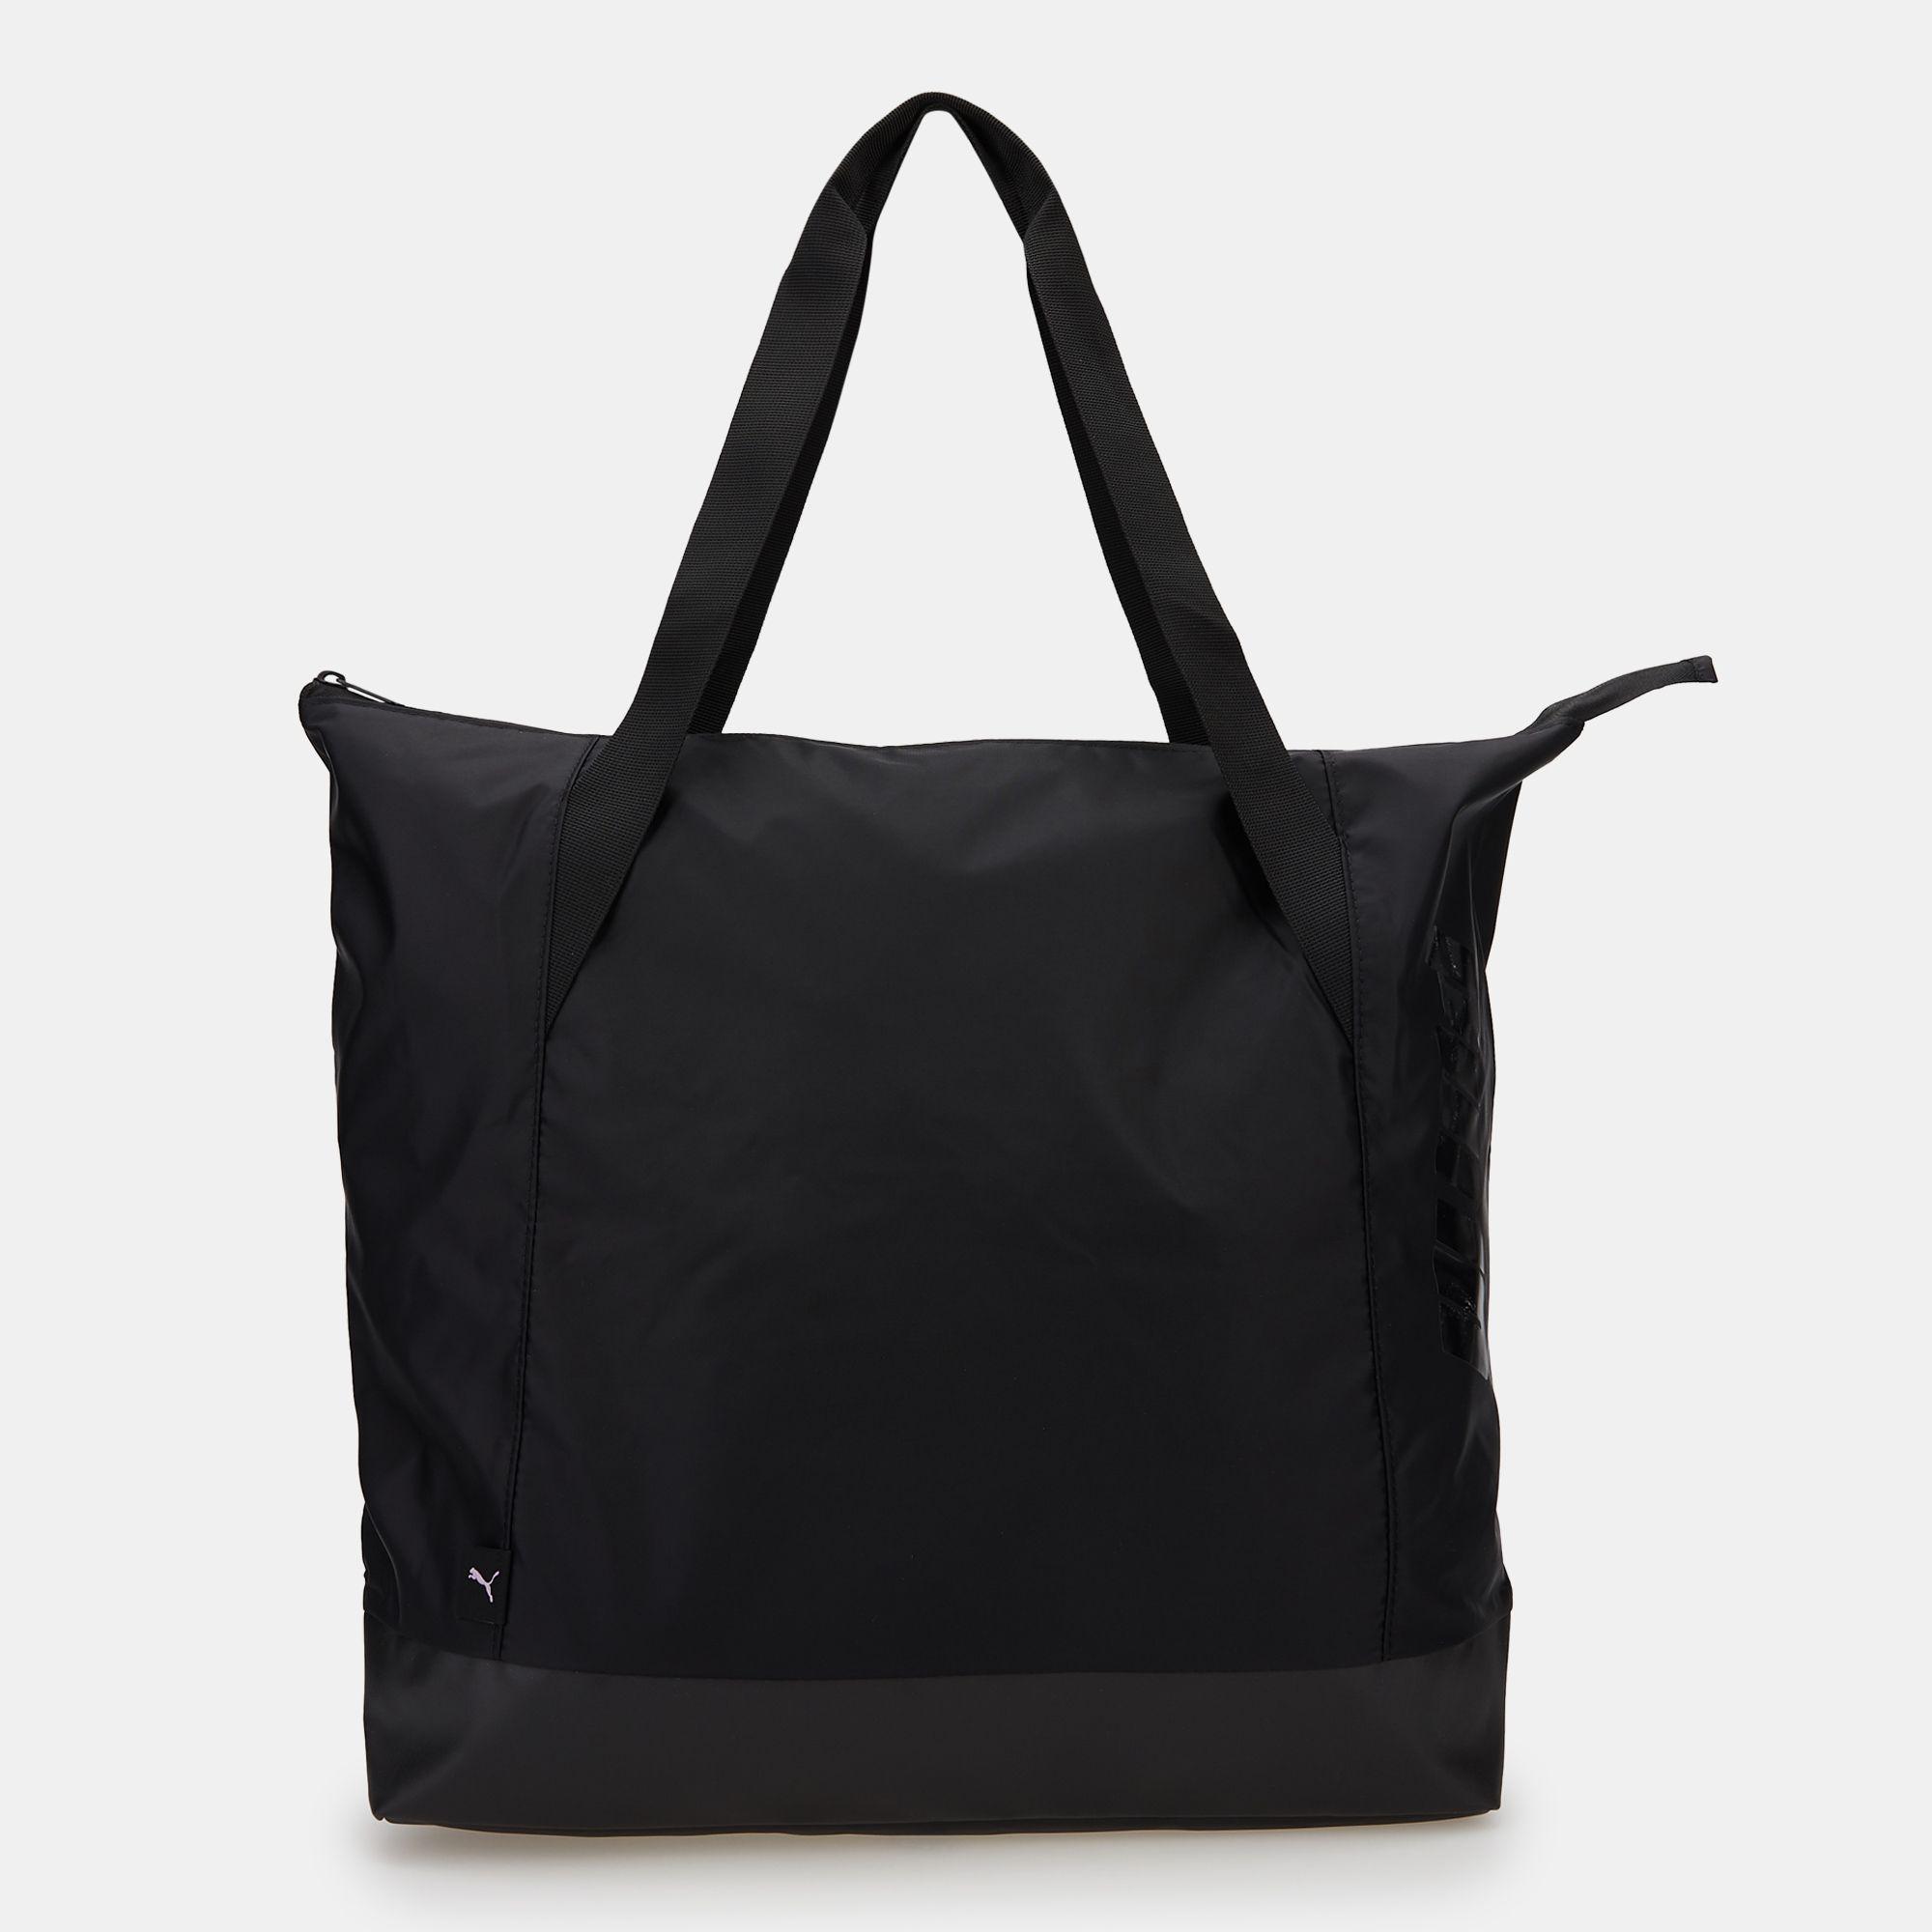 ab0264339e PUMA Women s AT Large Shopper Bag